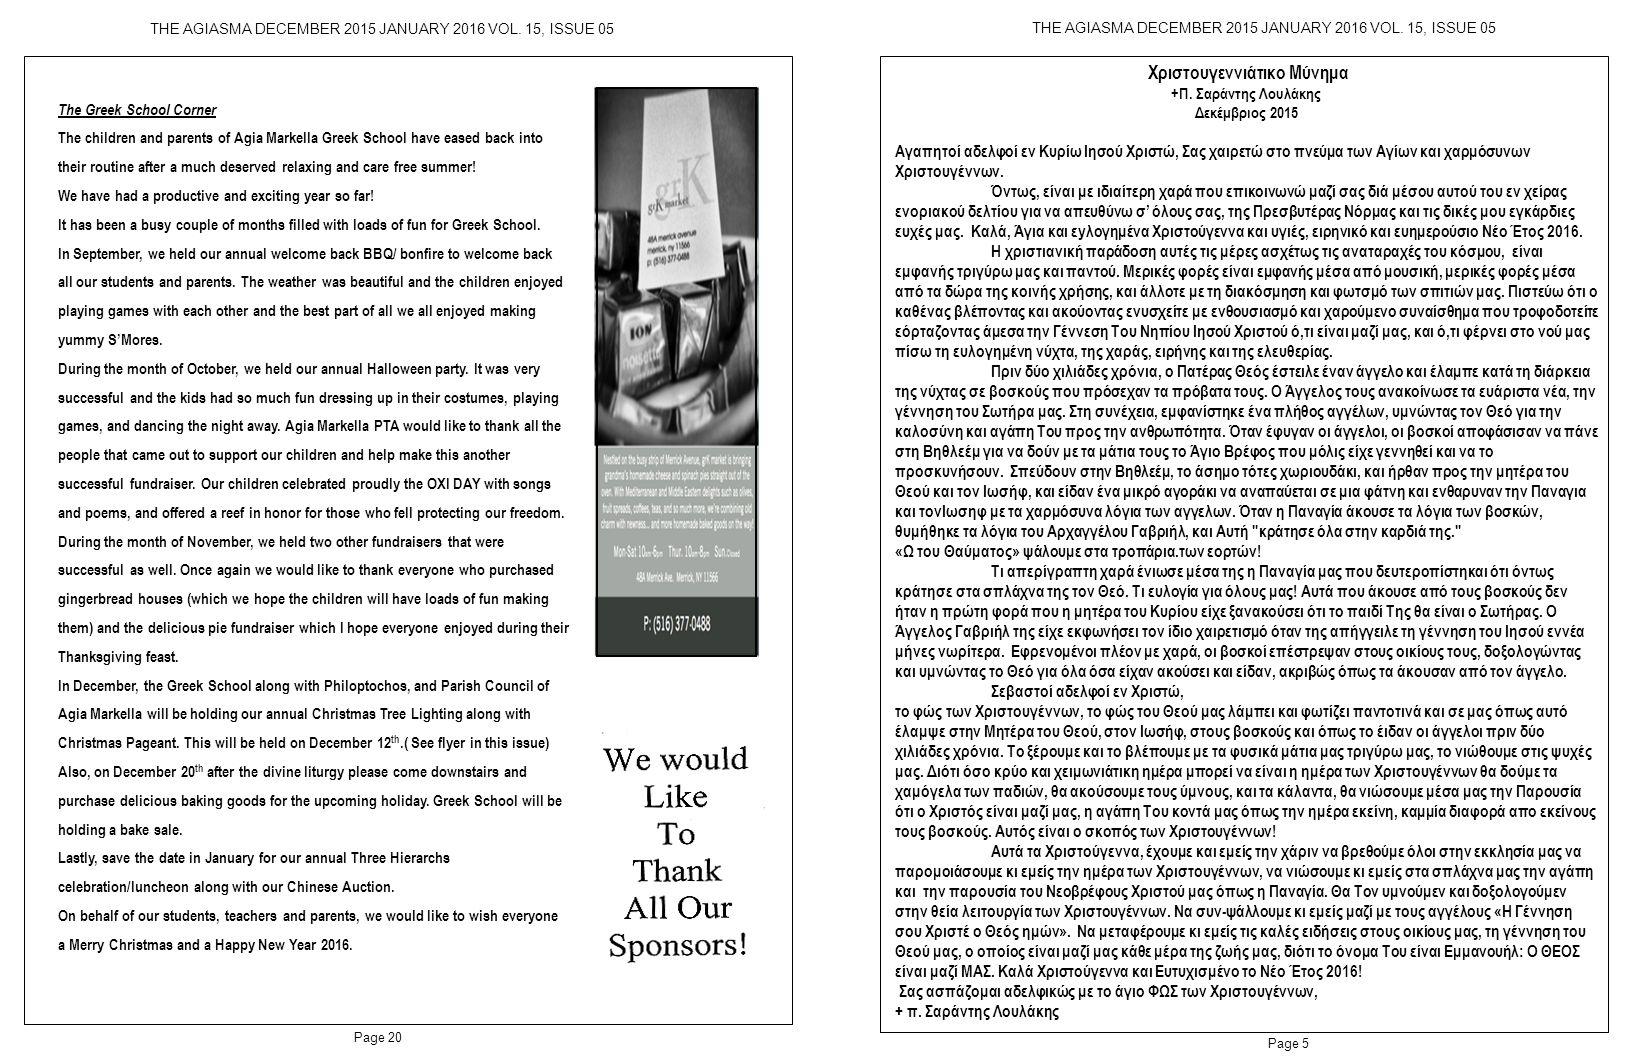 Page 20 Page 5 THE AGIASMA DECEMBER 2015 JANUARY 2016 VOL. 15, ISSUE 05 Χριστουγεννιάτικο Μύνημα +Π. Σαράντης Λουλάκης Δεκέμβριος 2015 Αγαπητοί αδελφο